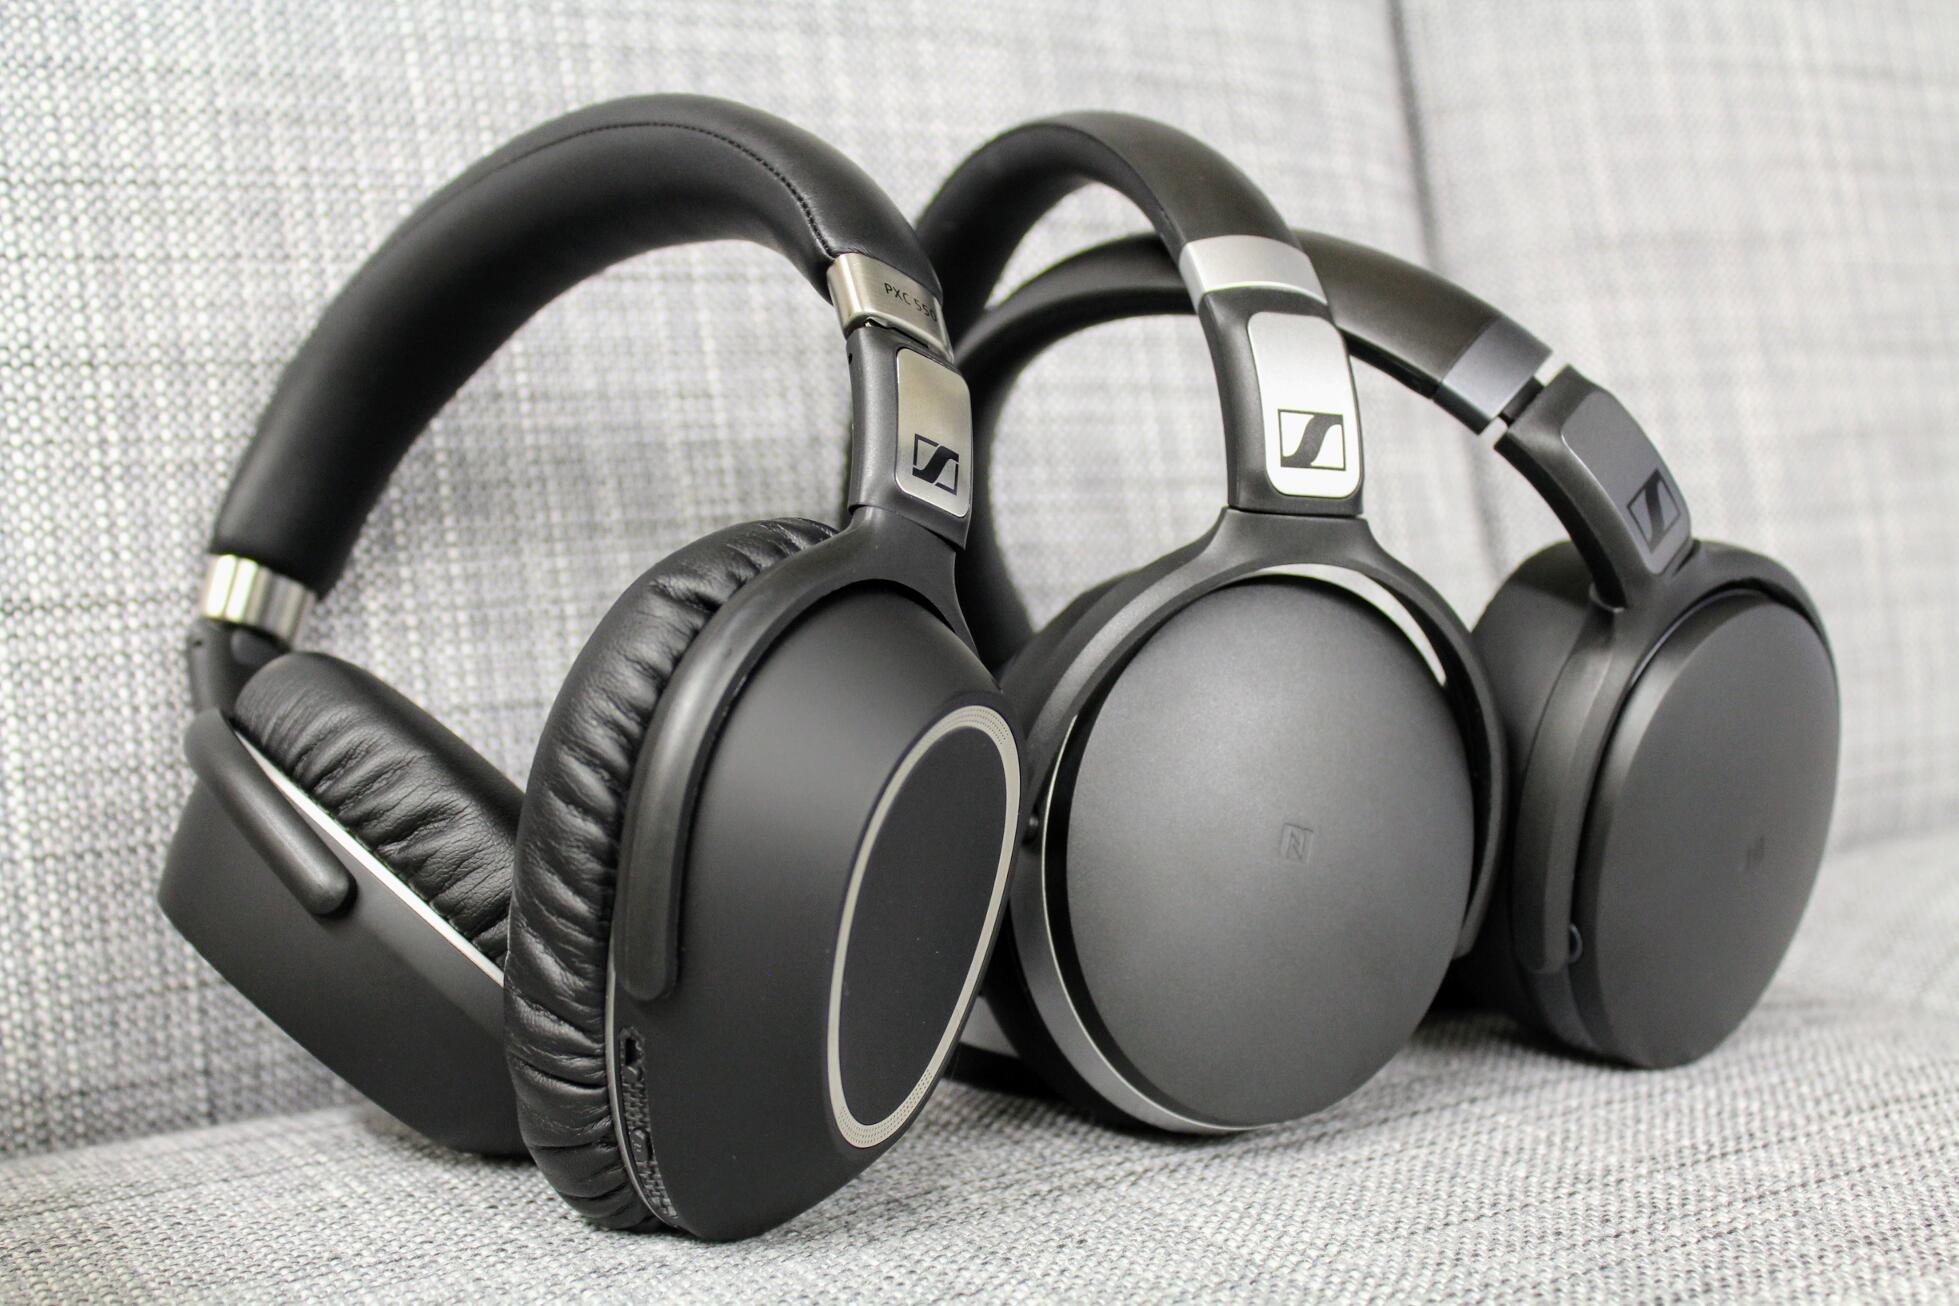 Sennheiser Bluetooth Headsets